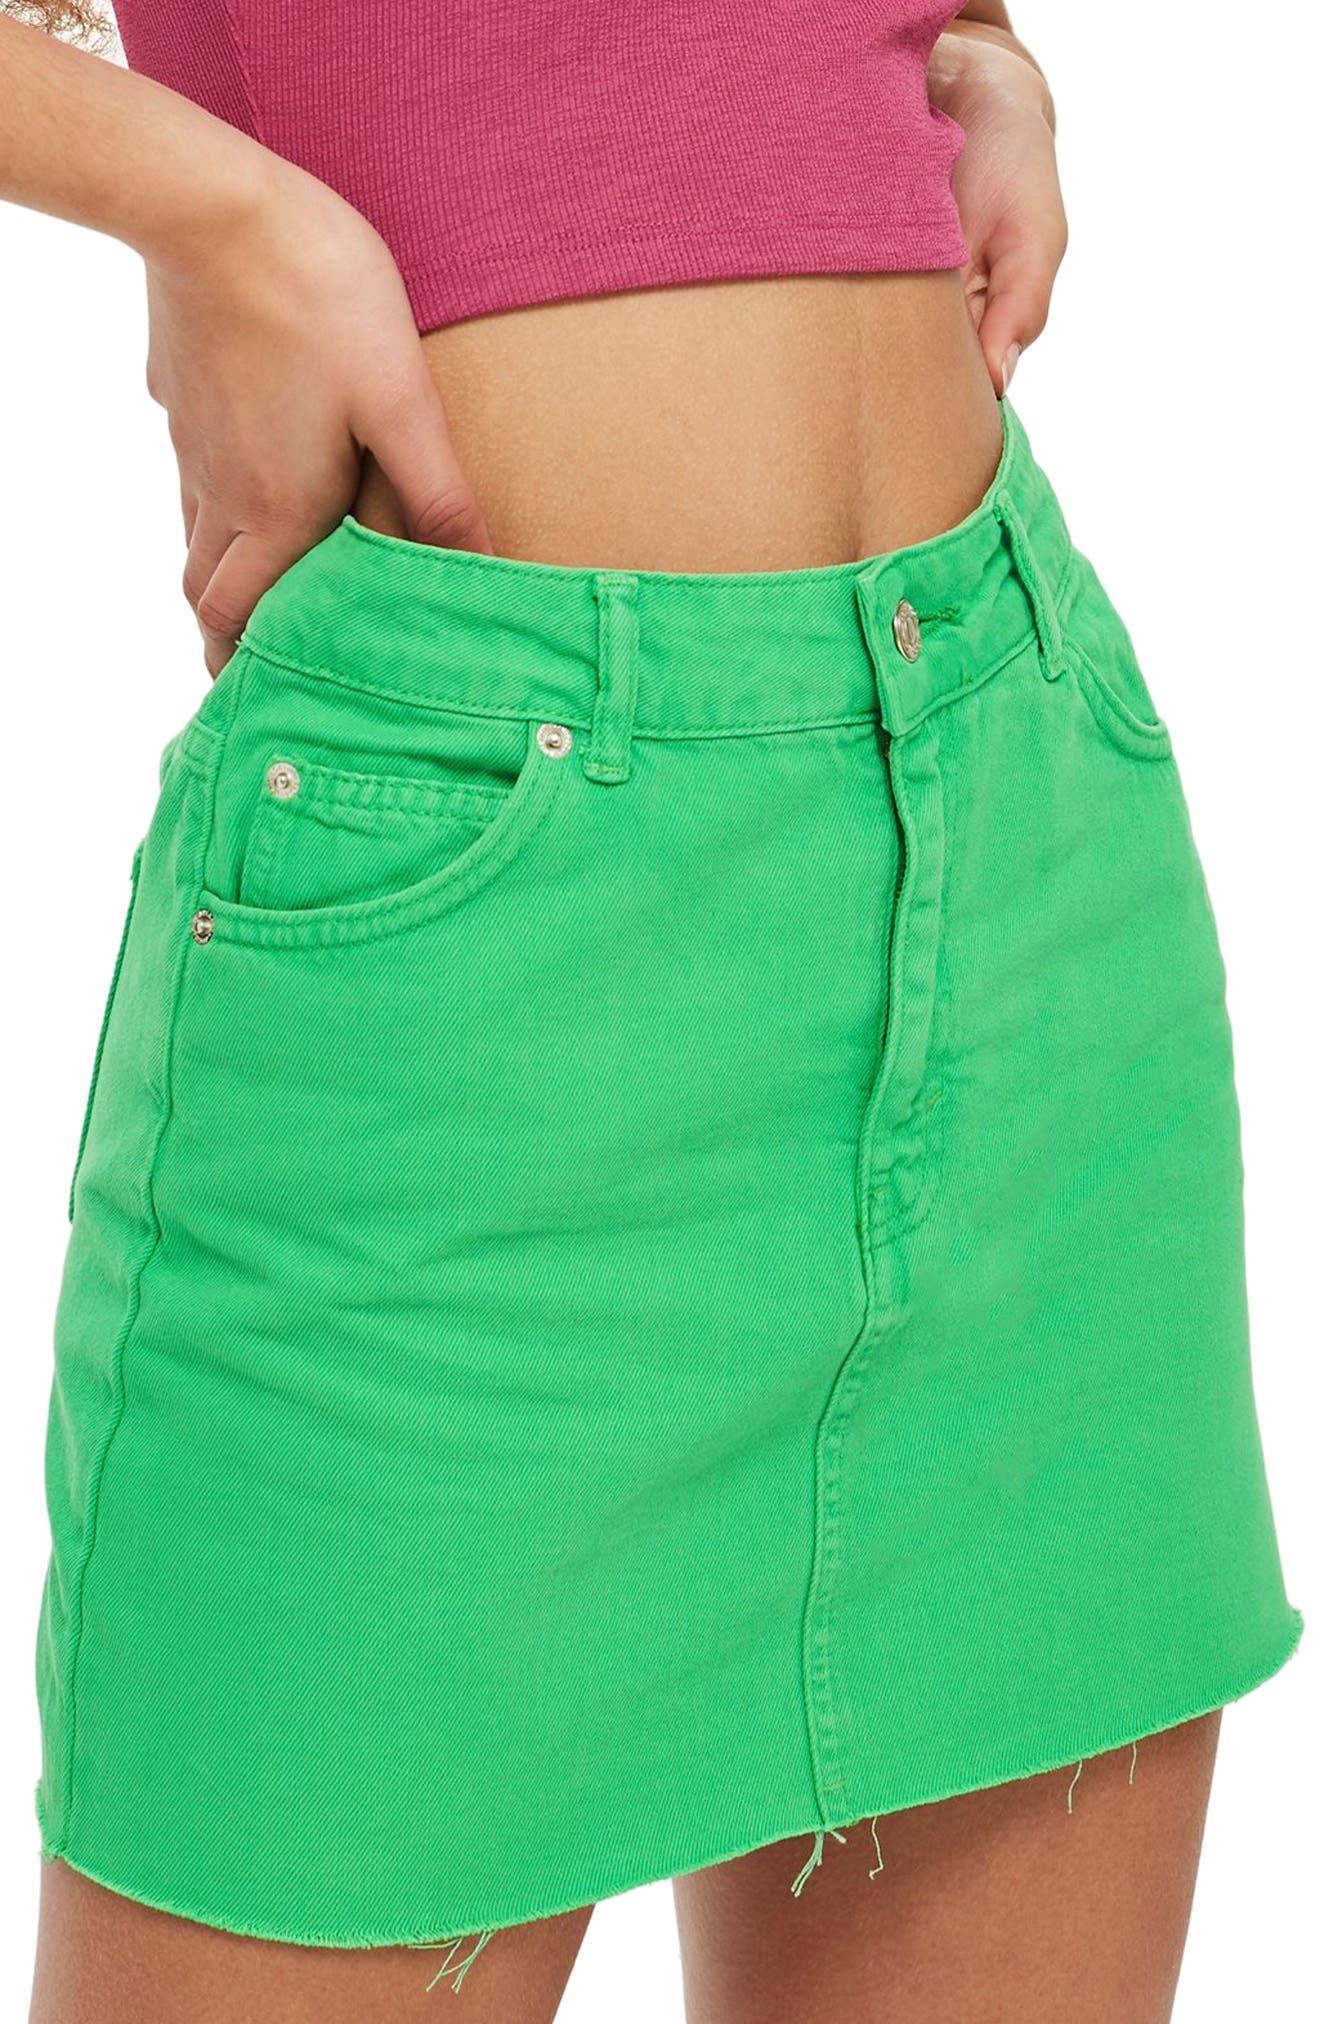 MOTO High Waist Denim Skirt,                             Main thumbnail 1, color,                             320